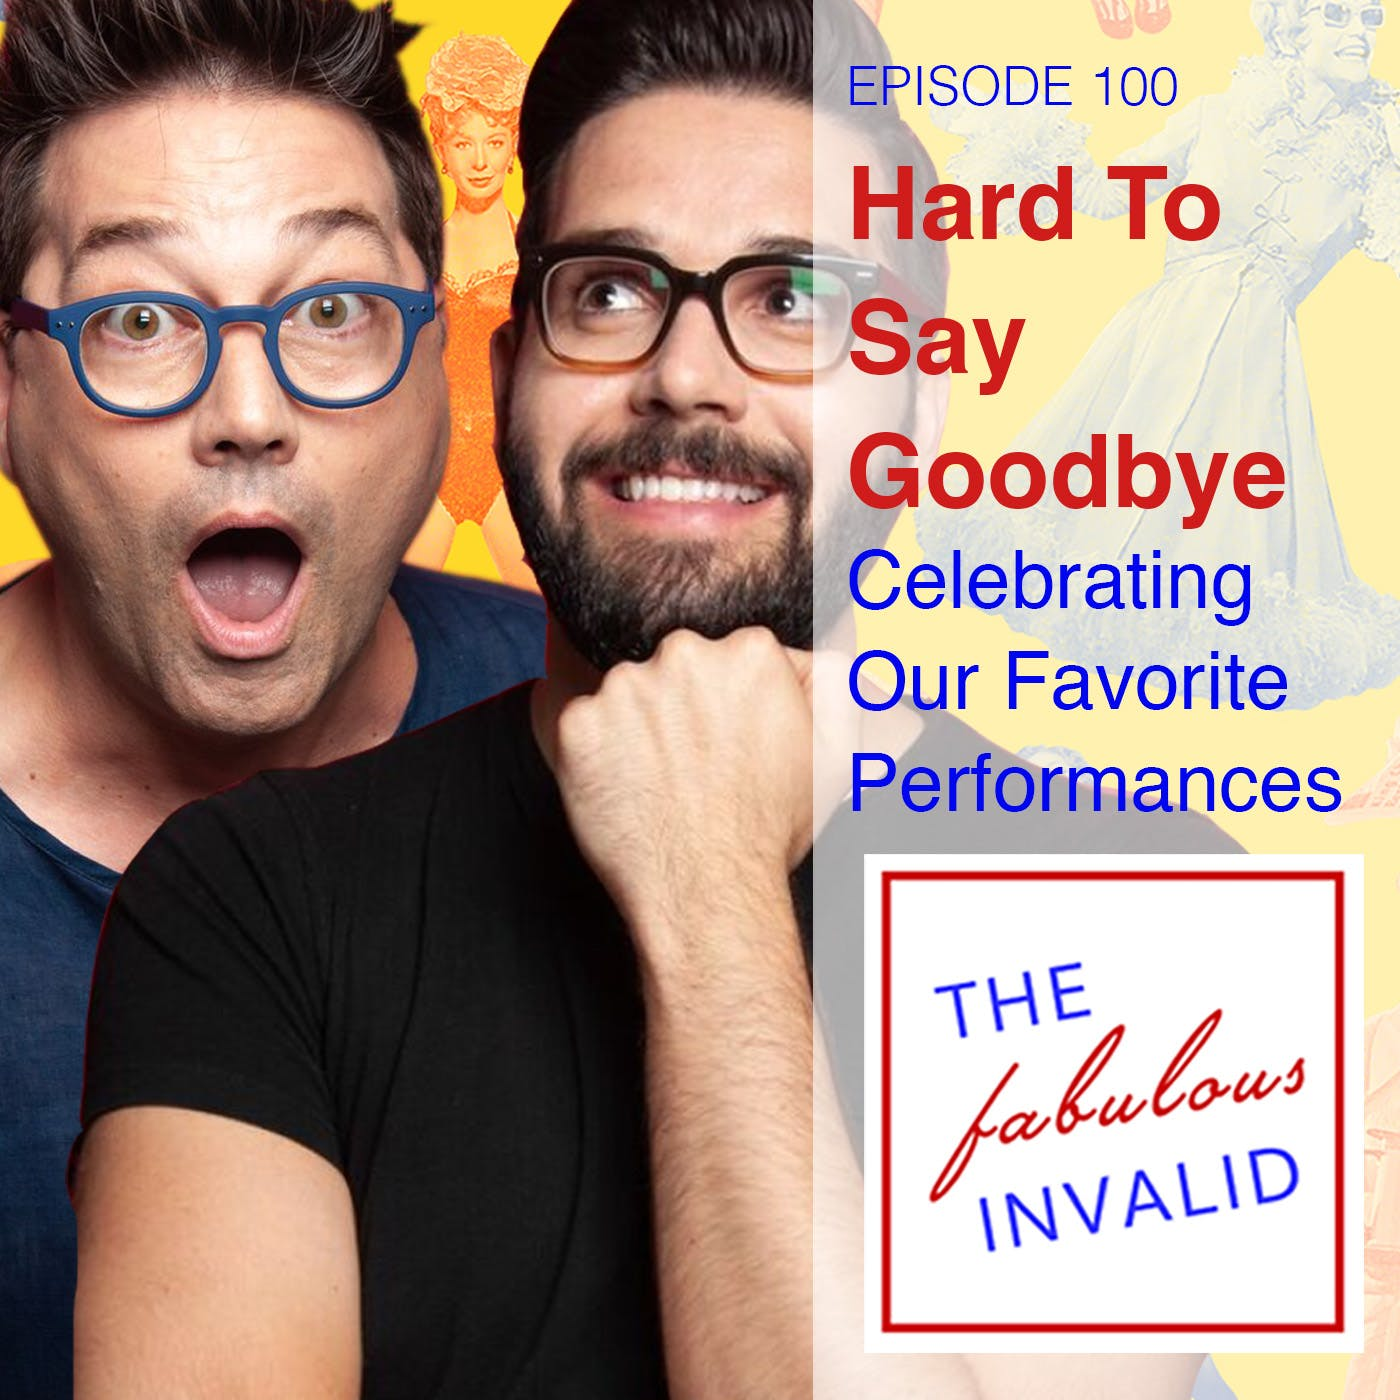 Episode 100: Hard to Say Goodbye: Celebrating Our Favorite Performances